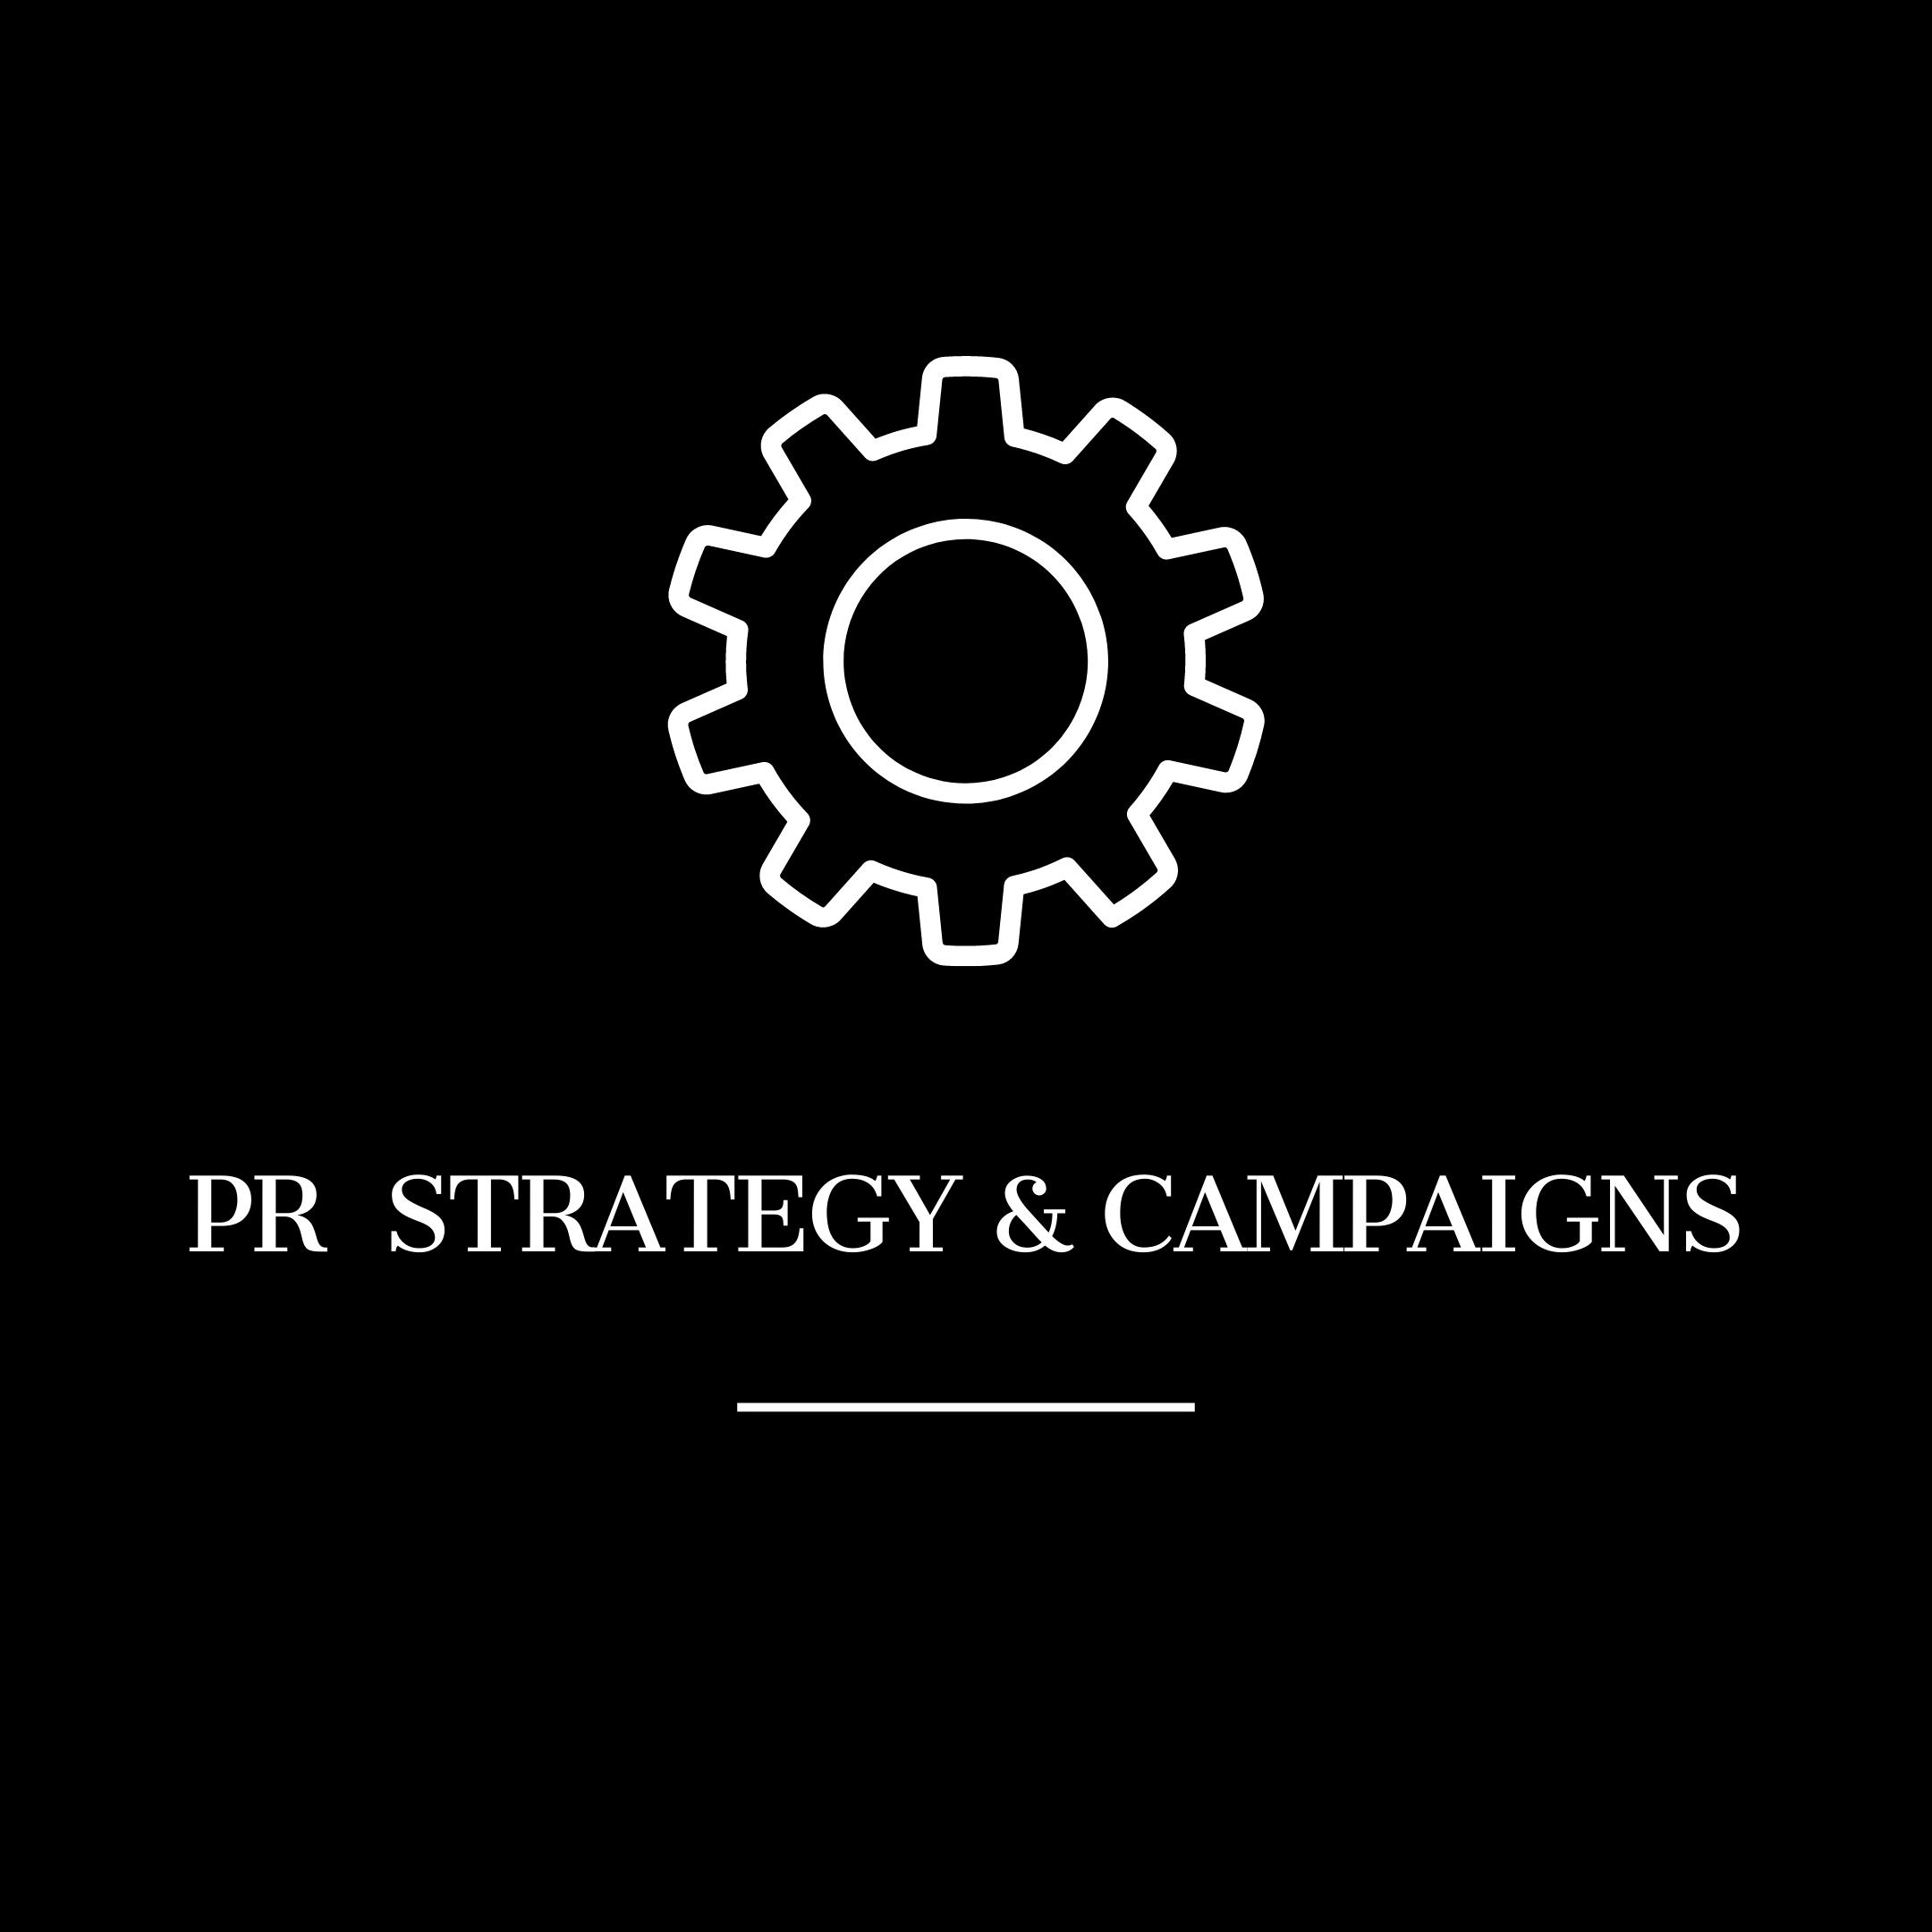 PR Strategy & Campaigns